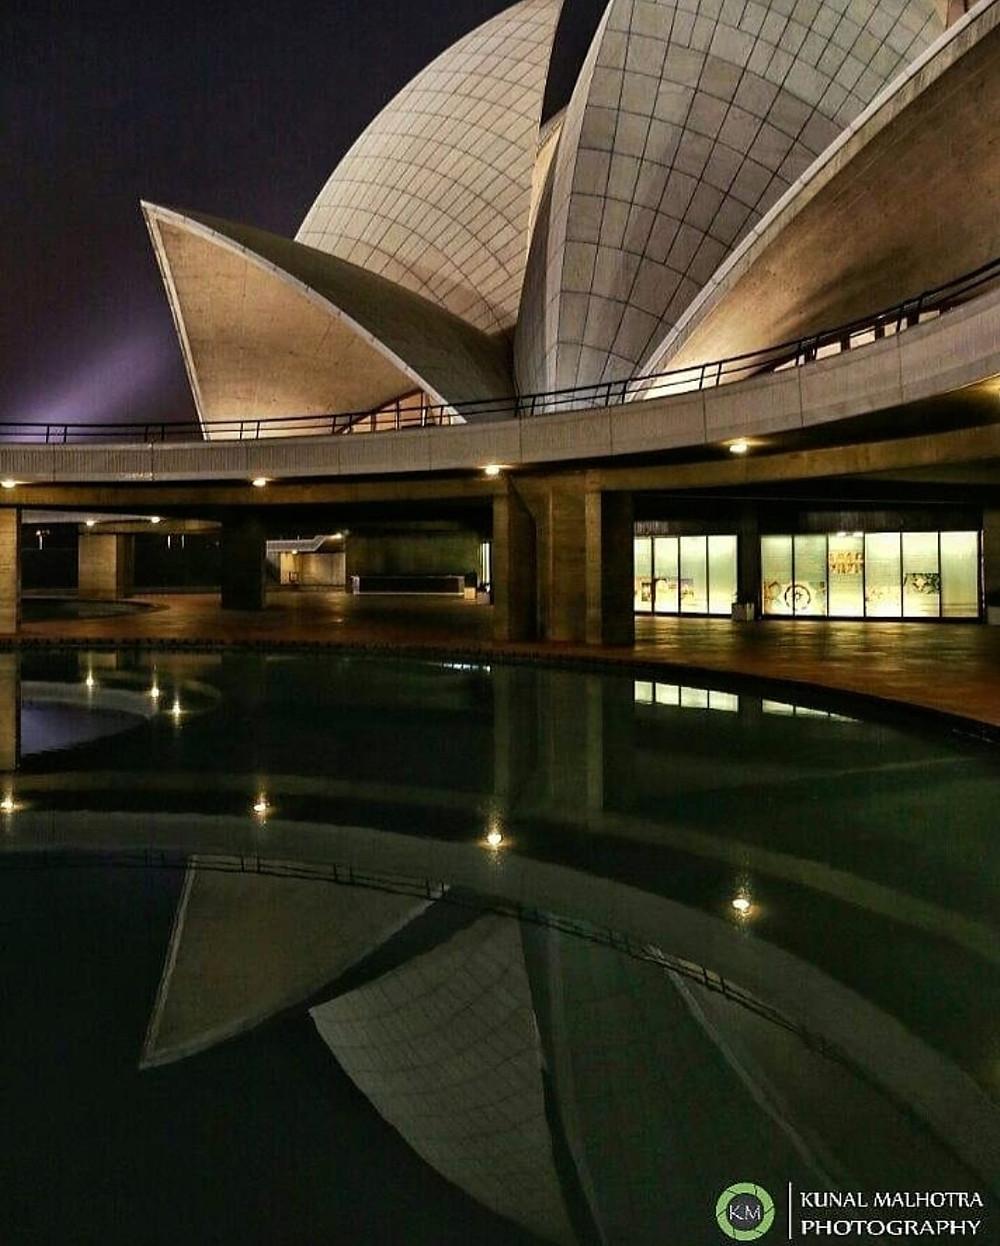 India Baha'i House of Worship Reflections